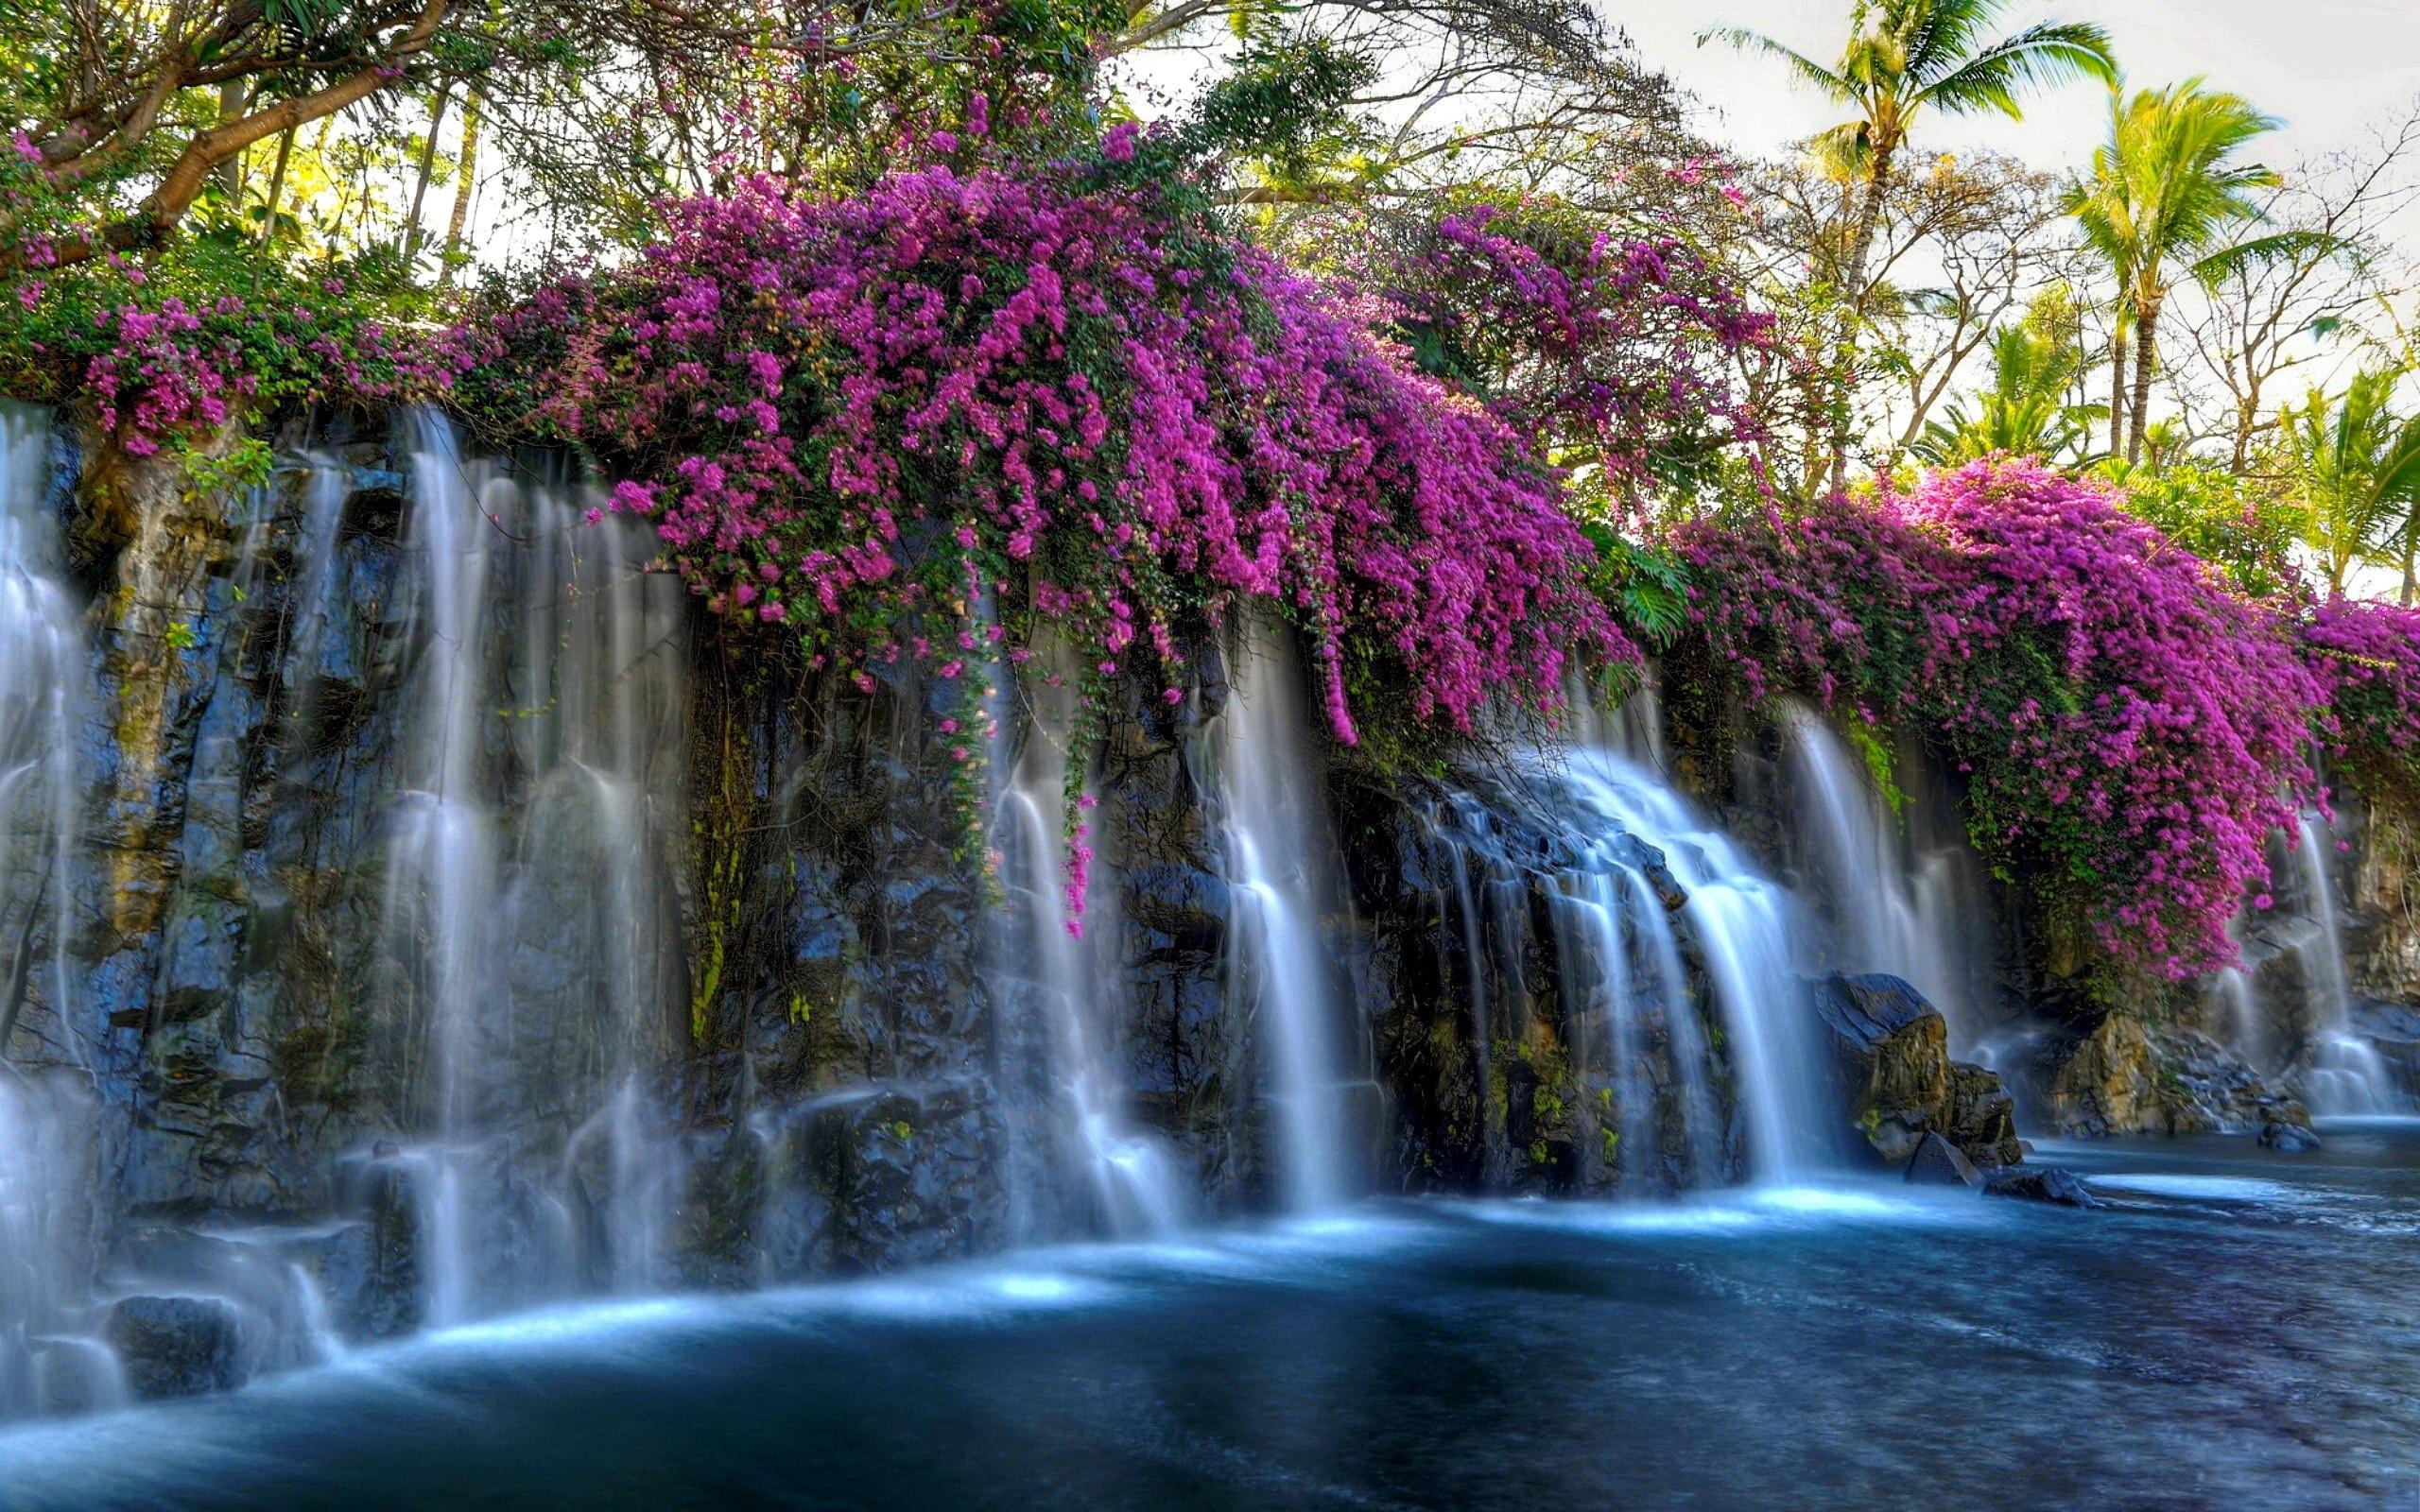 Download 2560x1600 Waterfall, Pink Flowers, Pond, Rocks, Moss ...